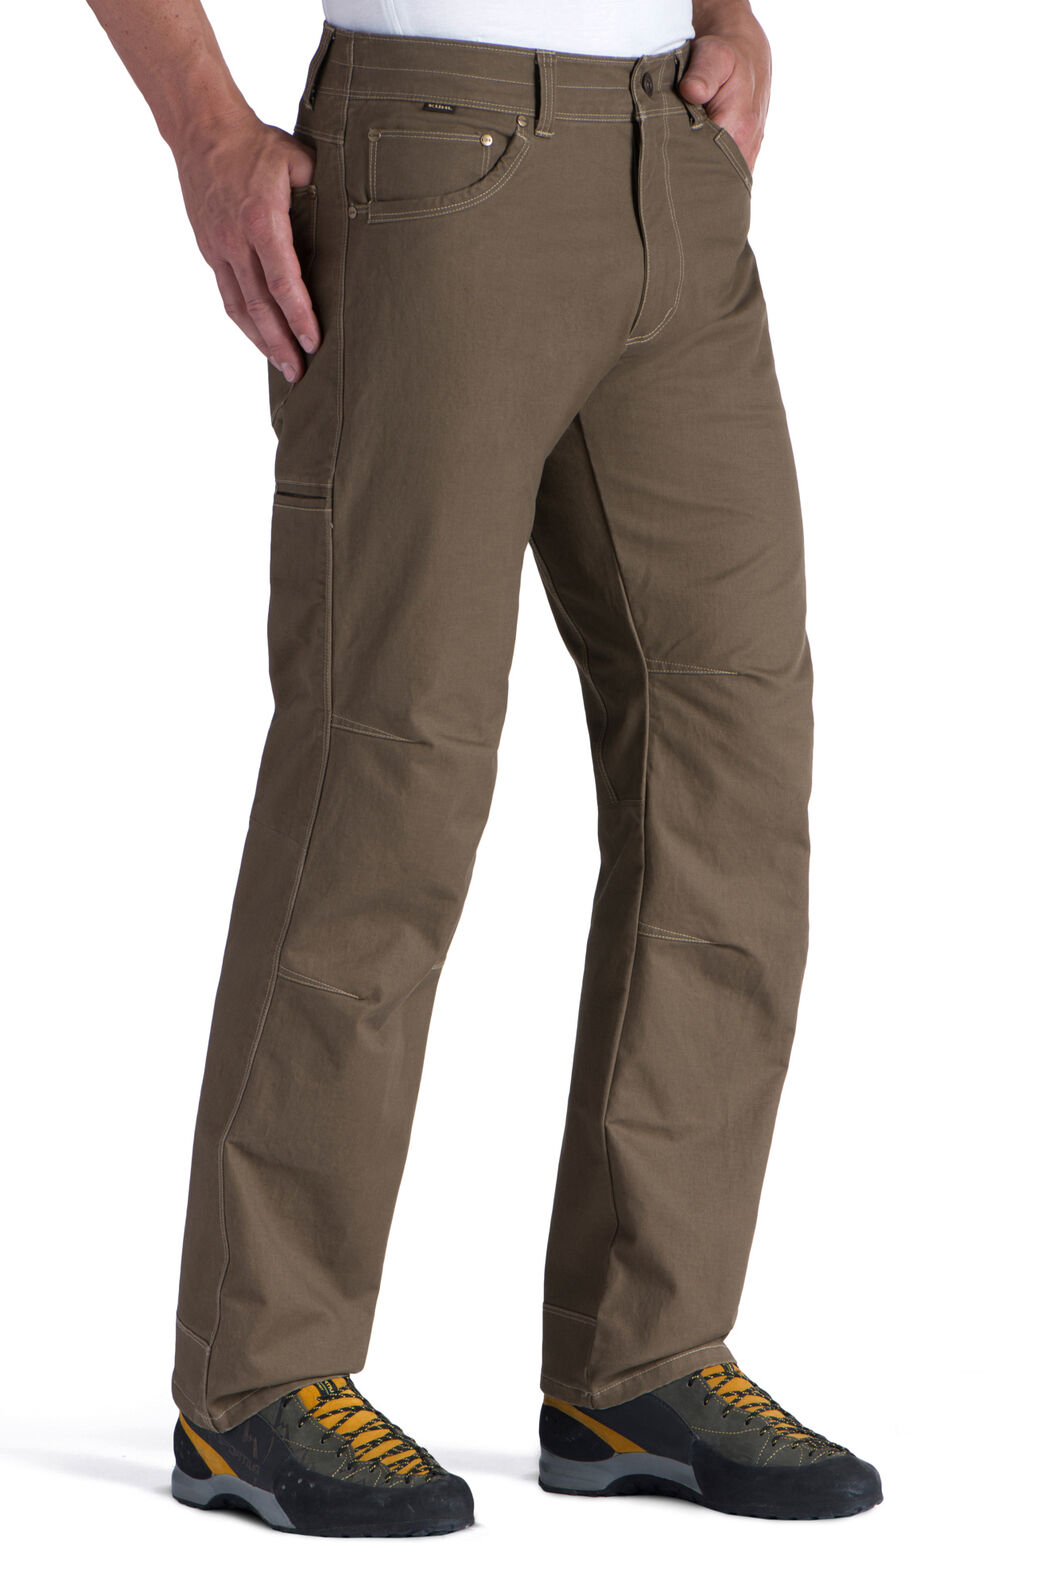 Kuhl Rydr Pants (34 inch) - Men's, Khaki, hi-res